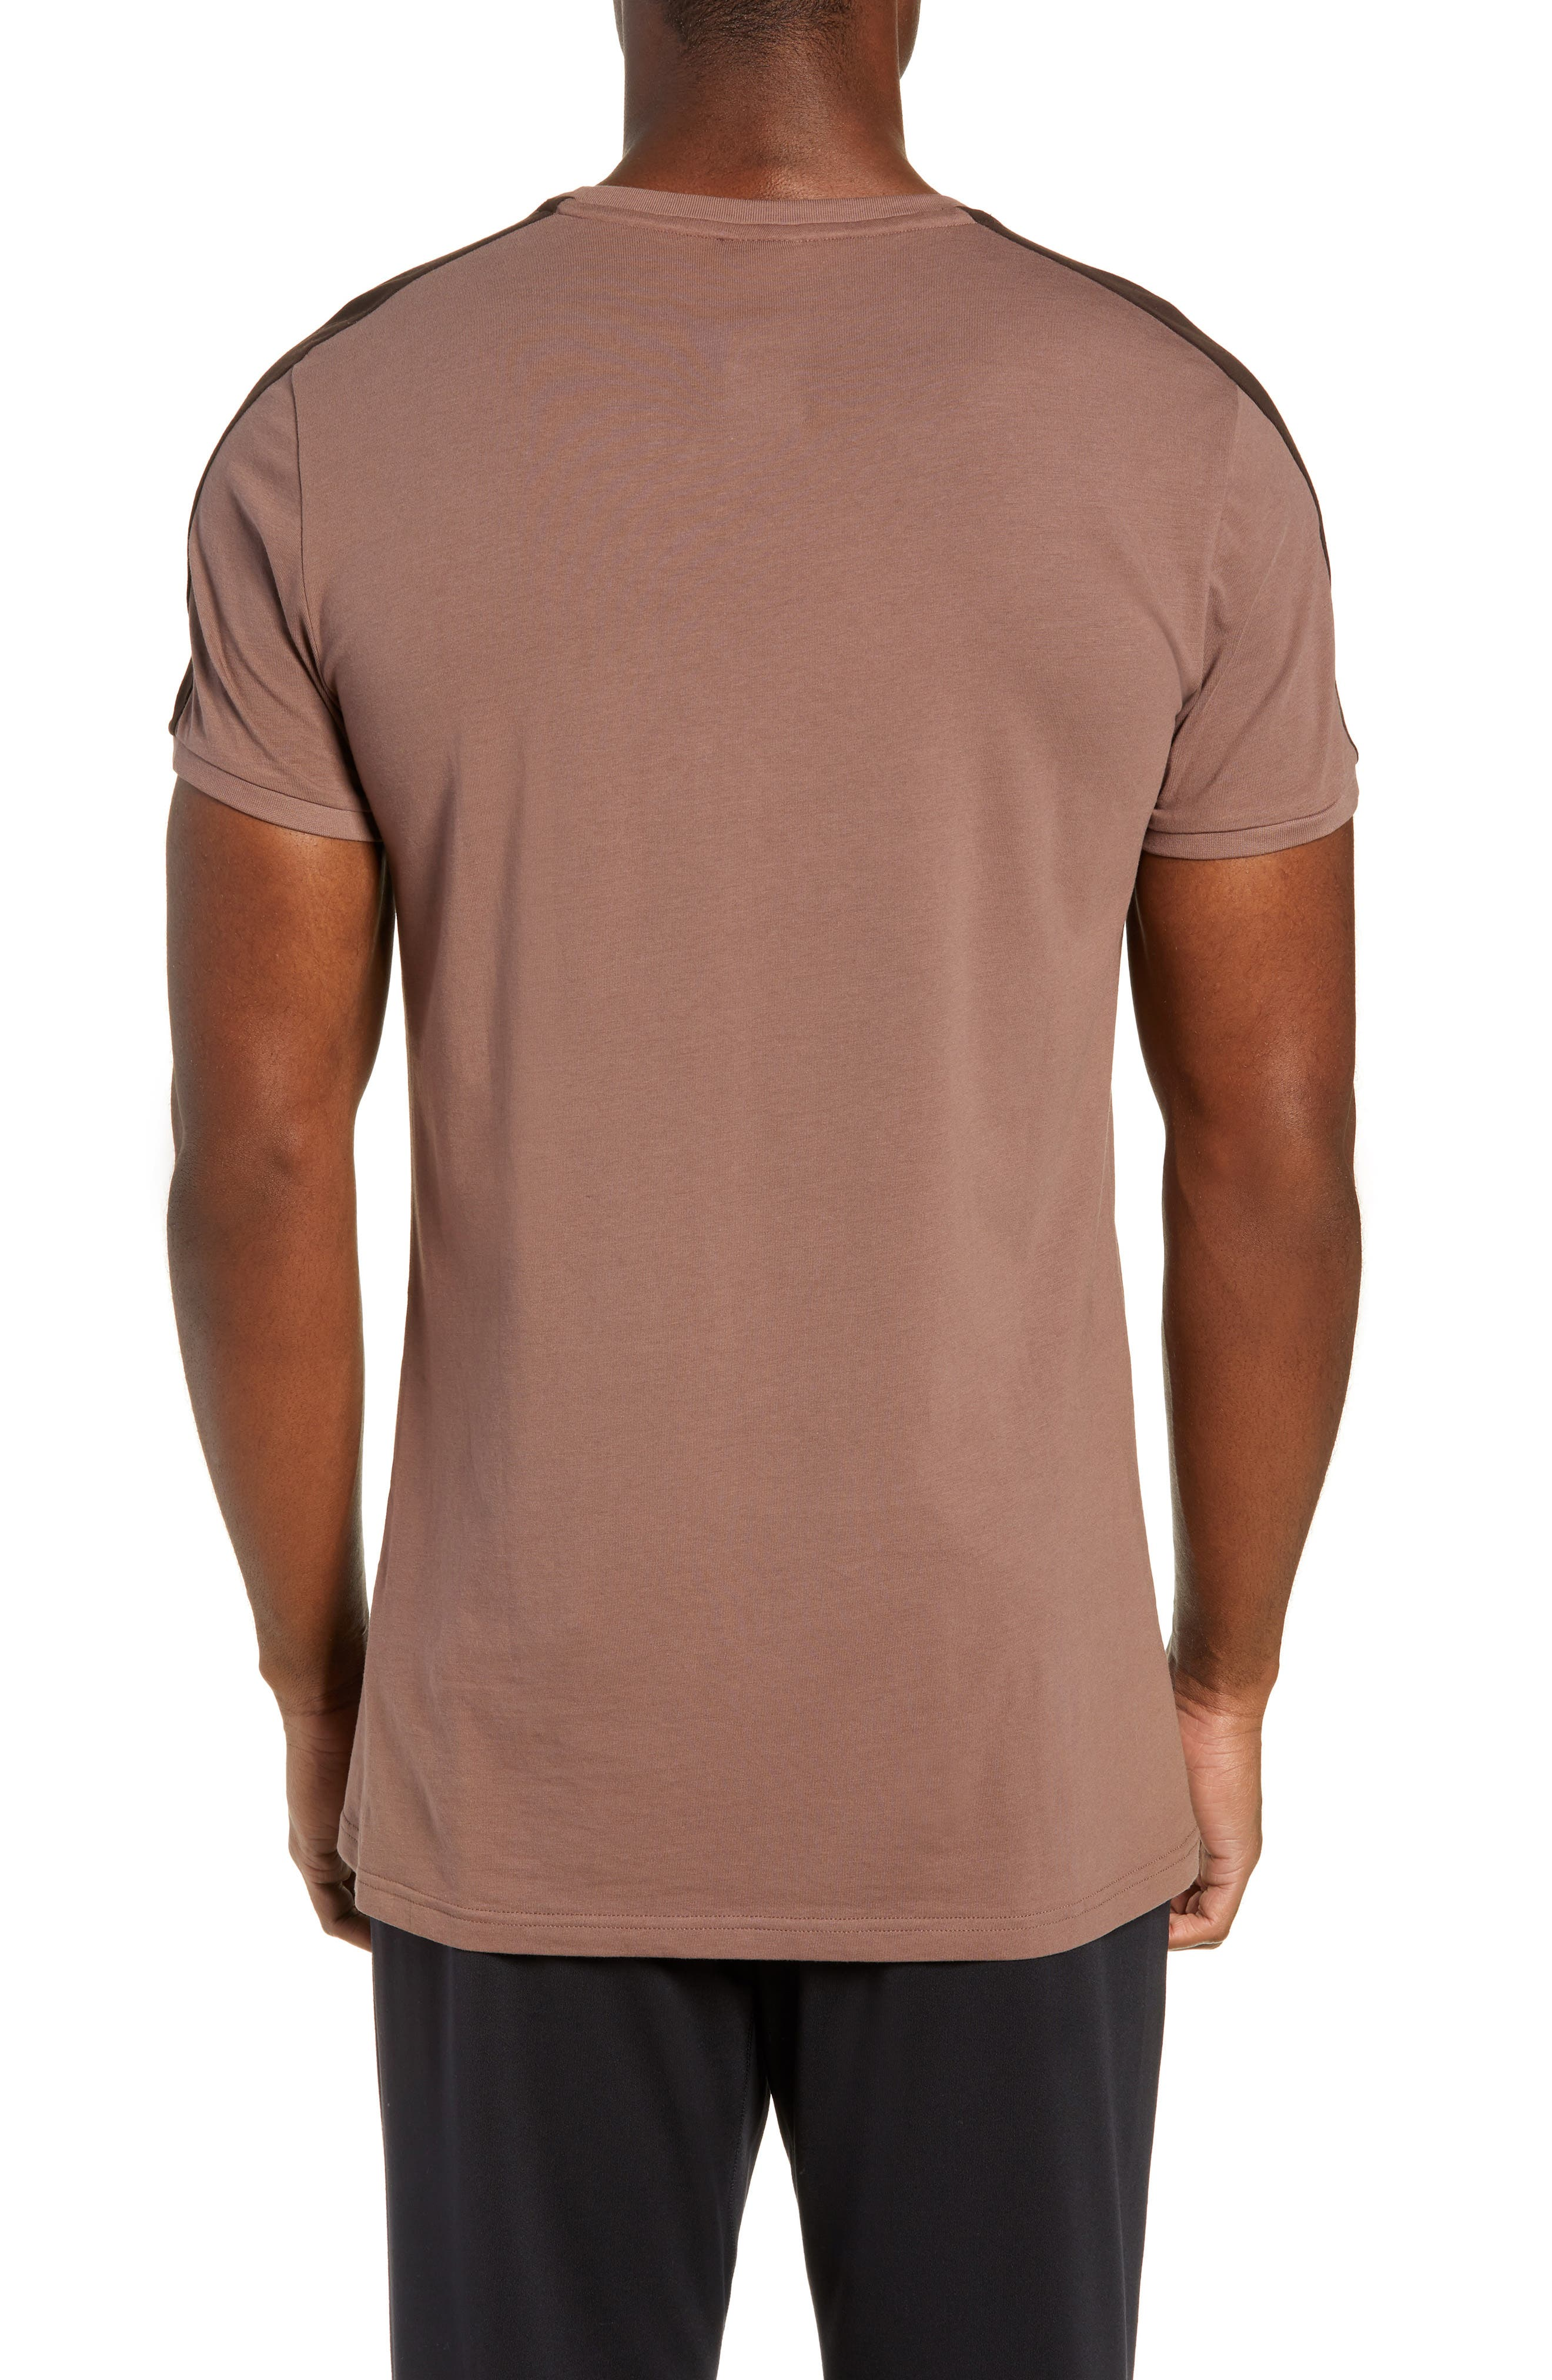 Classics Slim T7 T-Shirt,                             Alternate thumbnail 2, color,                             MEDIUM GRAY HEATHER